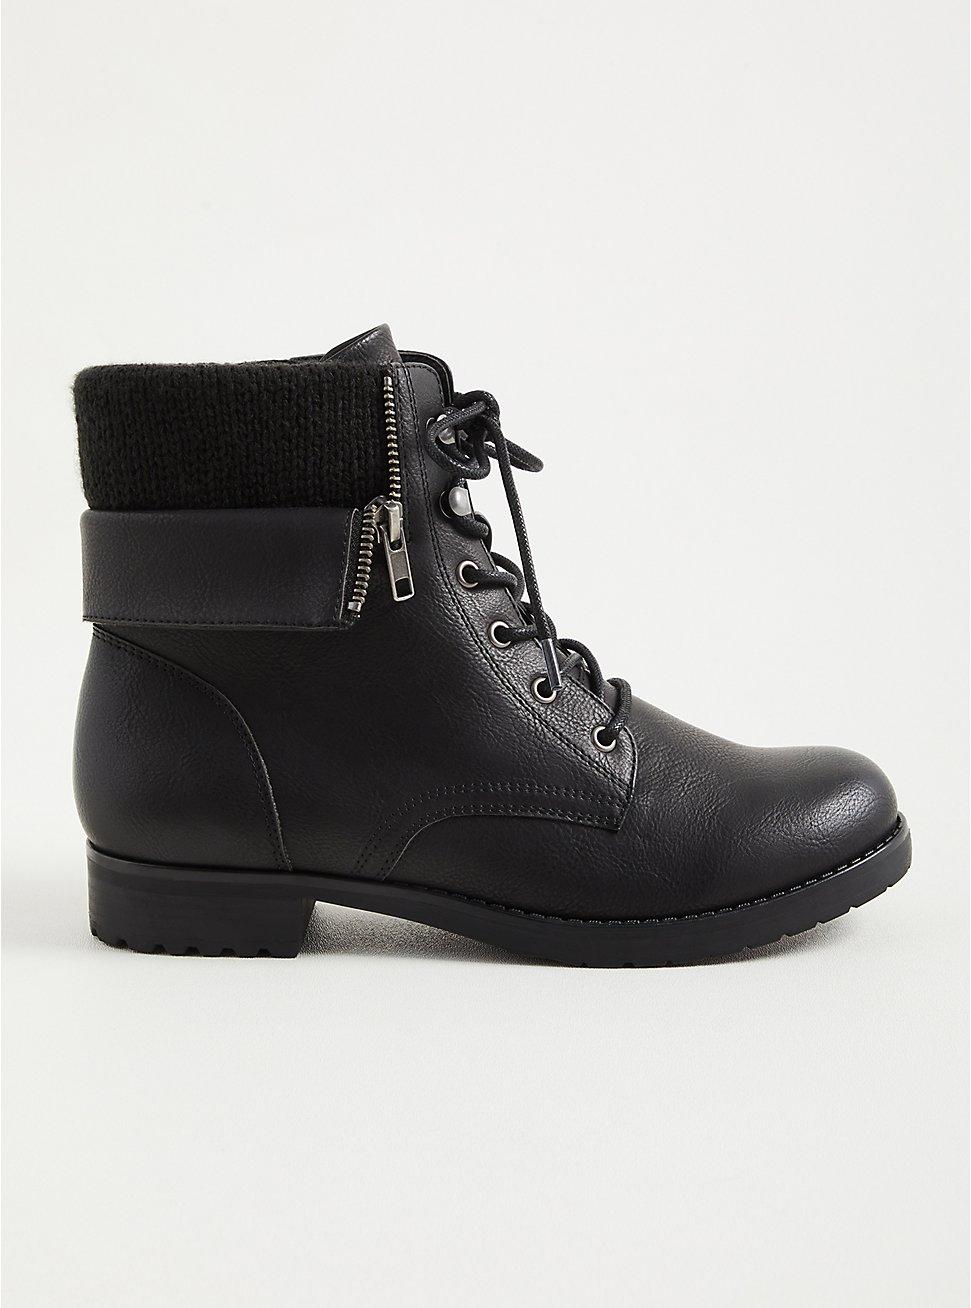 Plus Size Black Foldover Sweater Combat Boot (WW), BLACK, hi-res